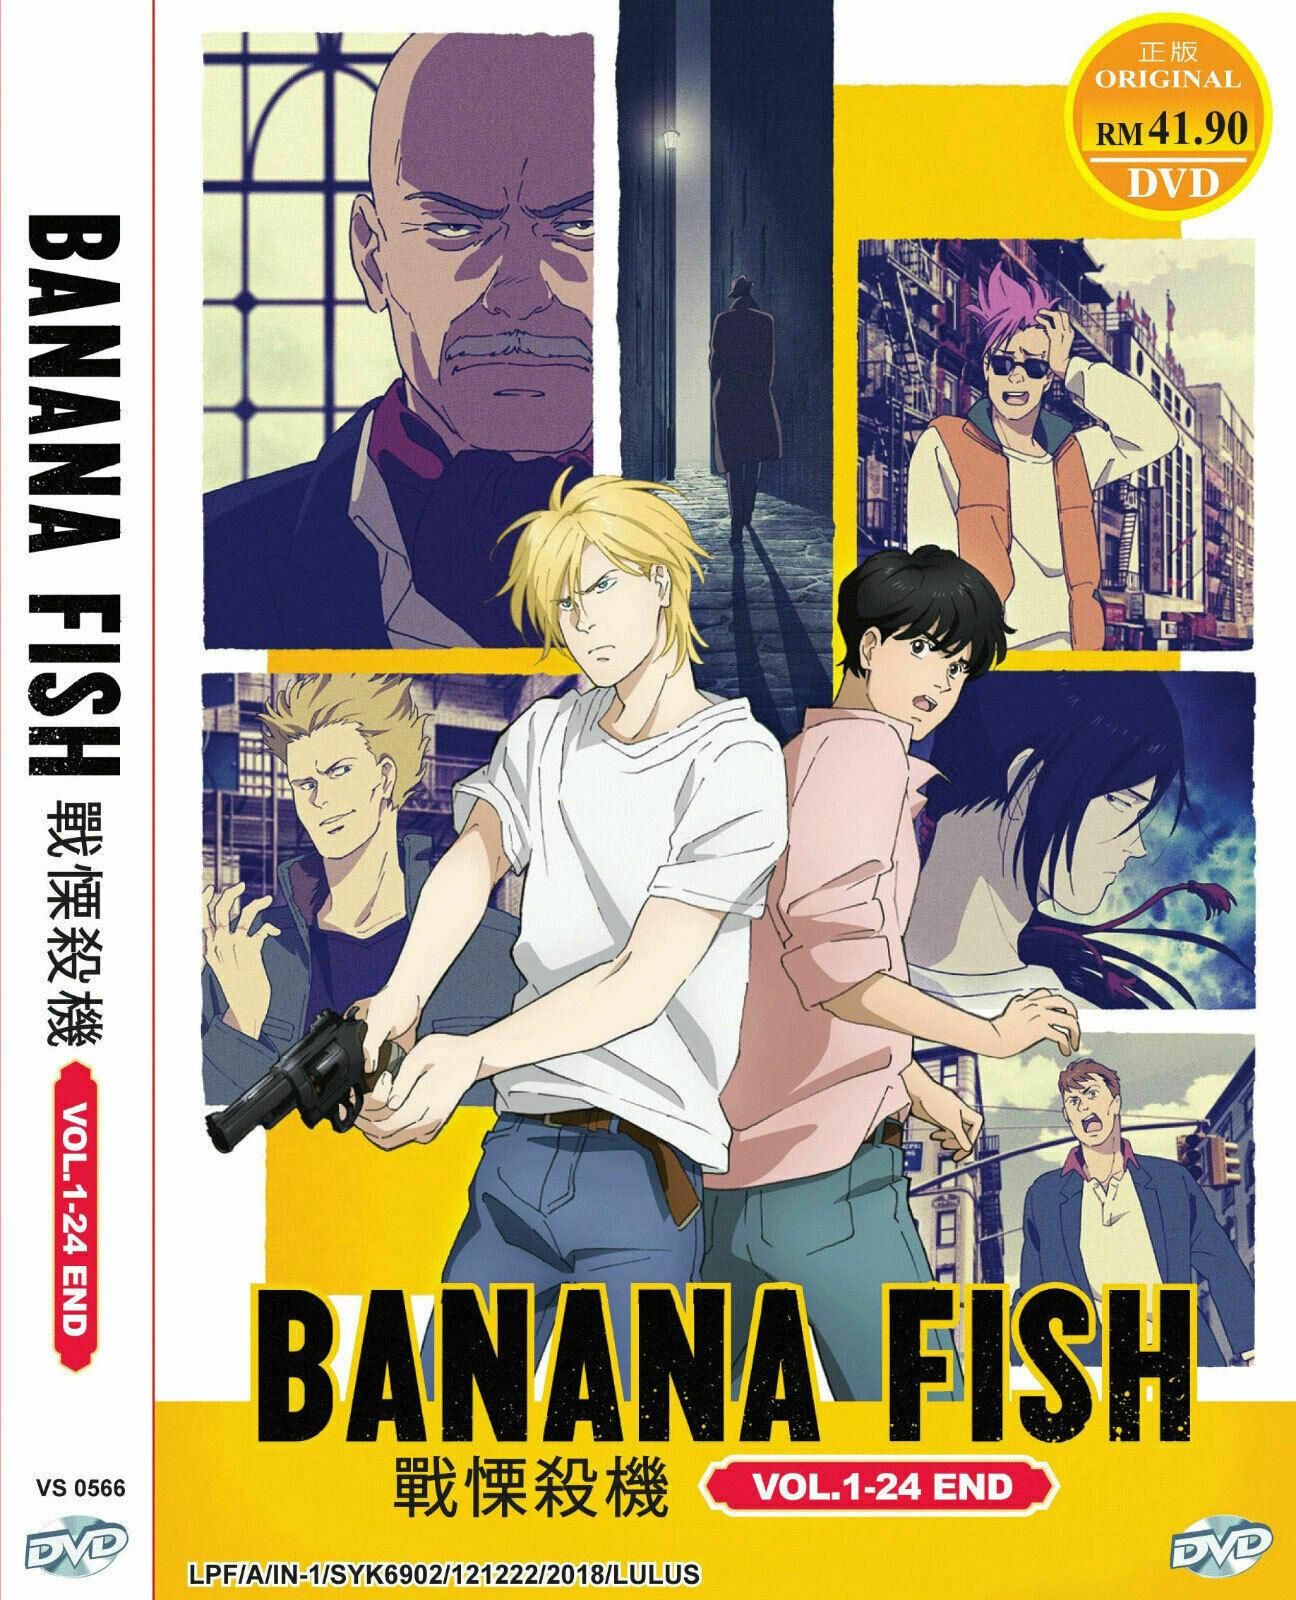 Banana Fish Complete TV Series Vol.1-24 End English Sub Reg All Ship From USA